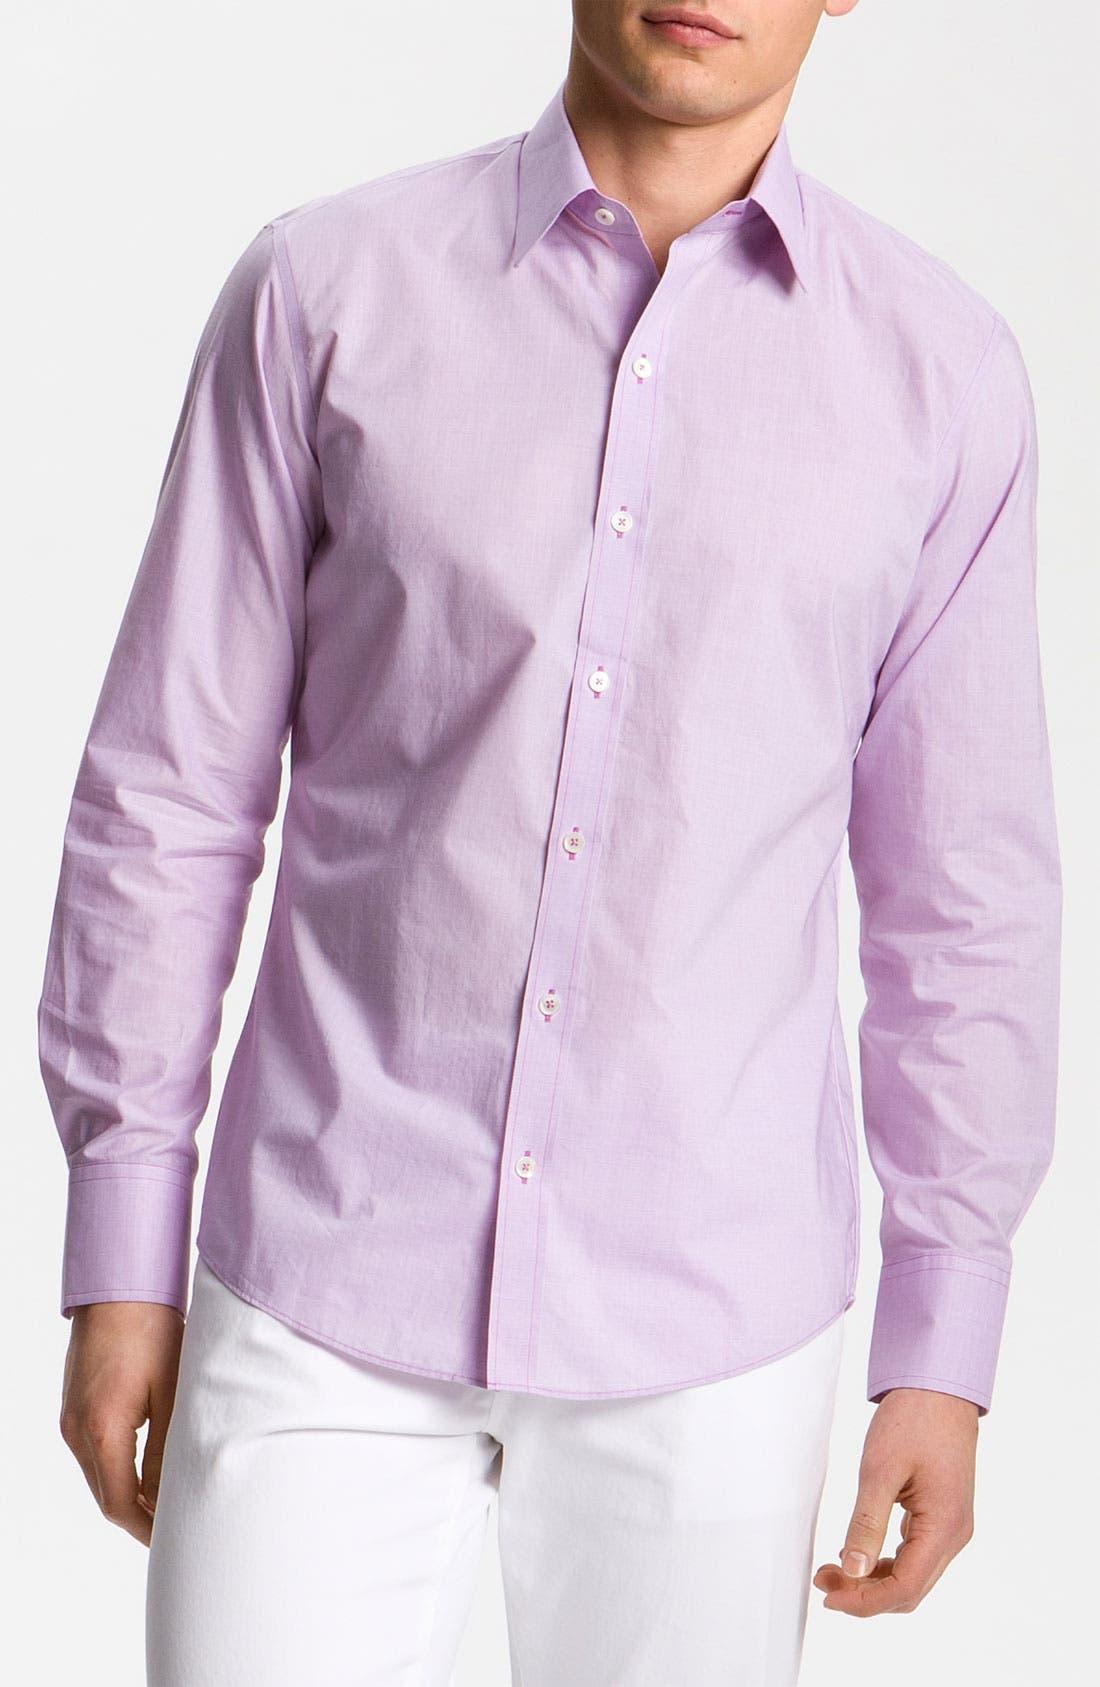 Alternate Image 1 Selected - Zachary Prell 'Latham' Sport Shirt